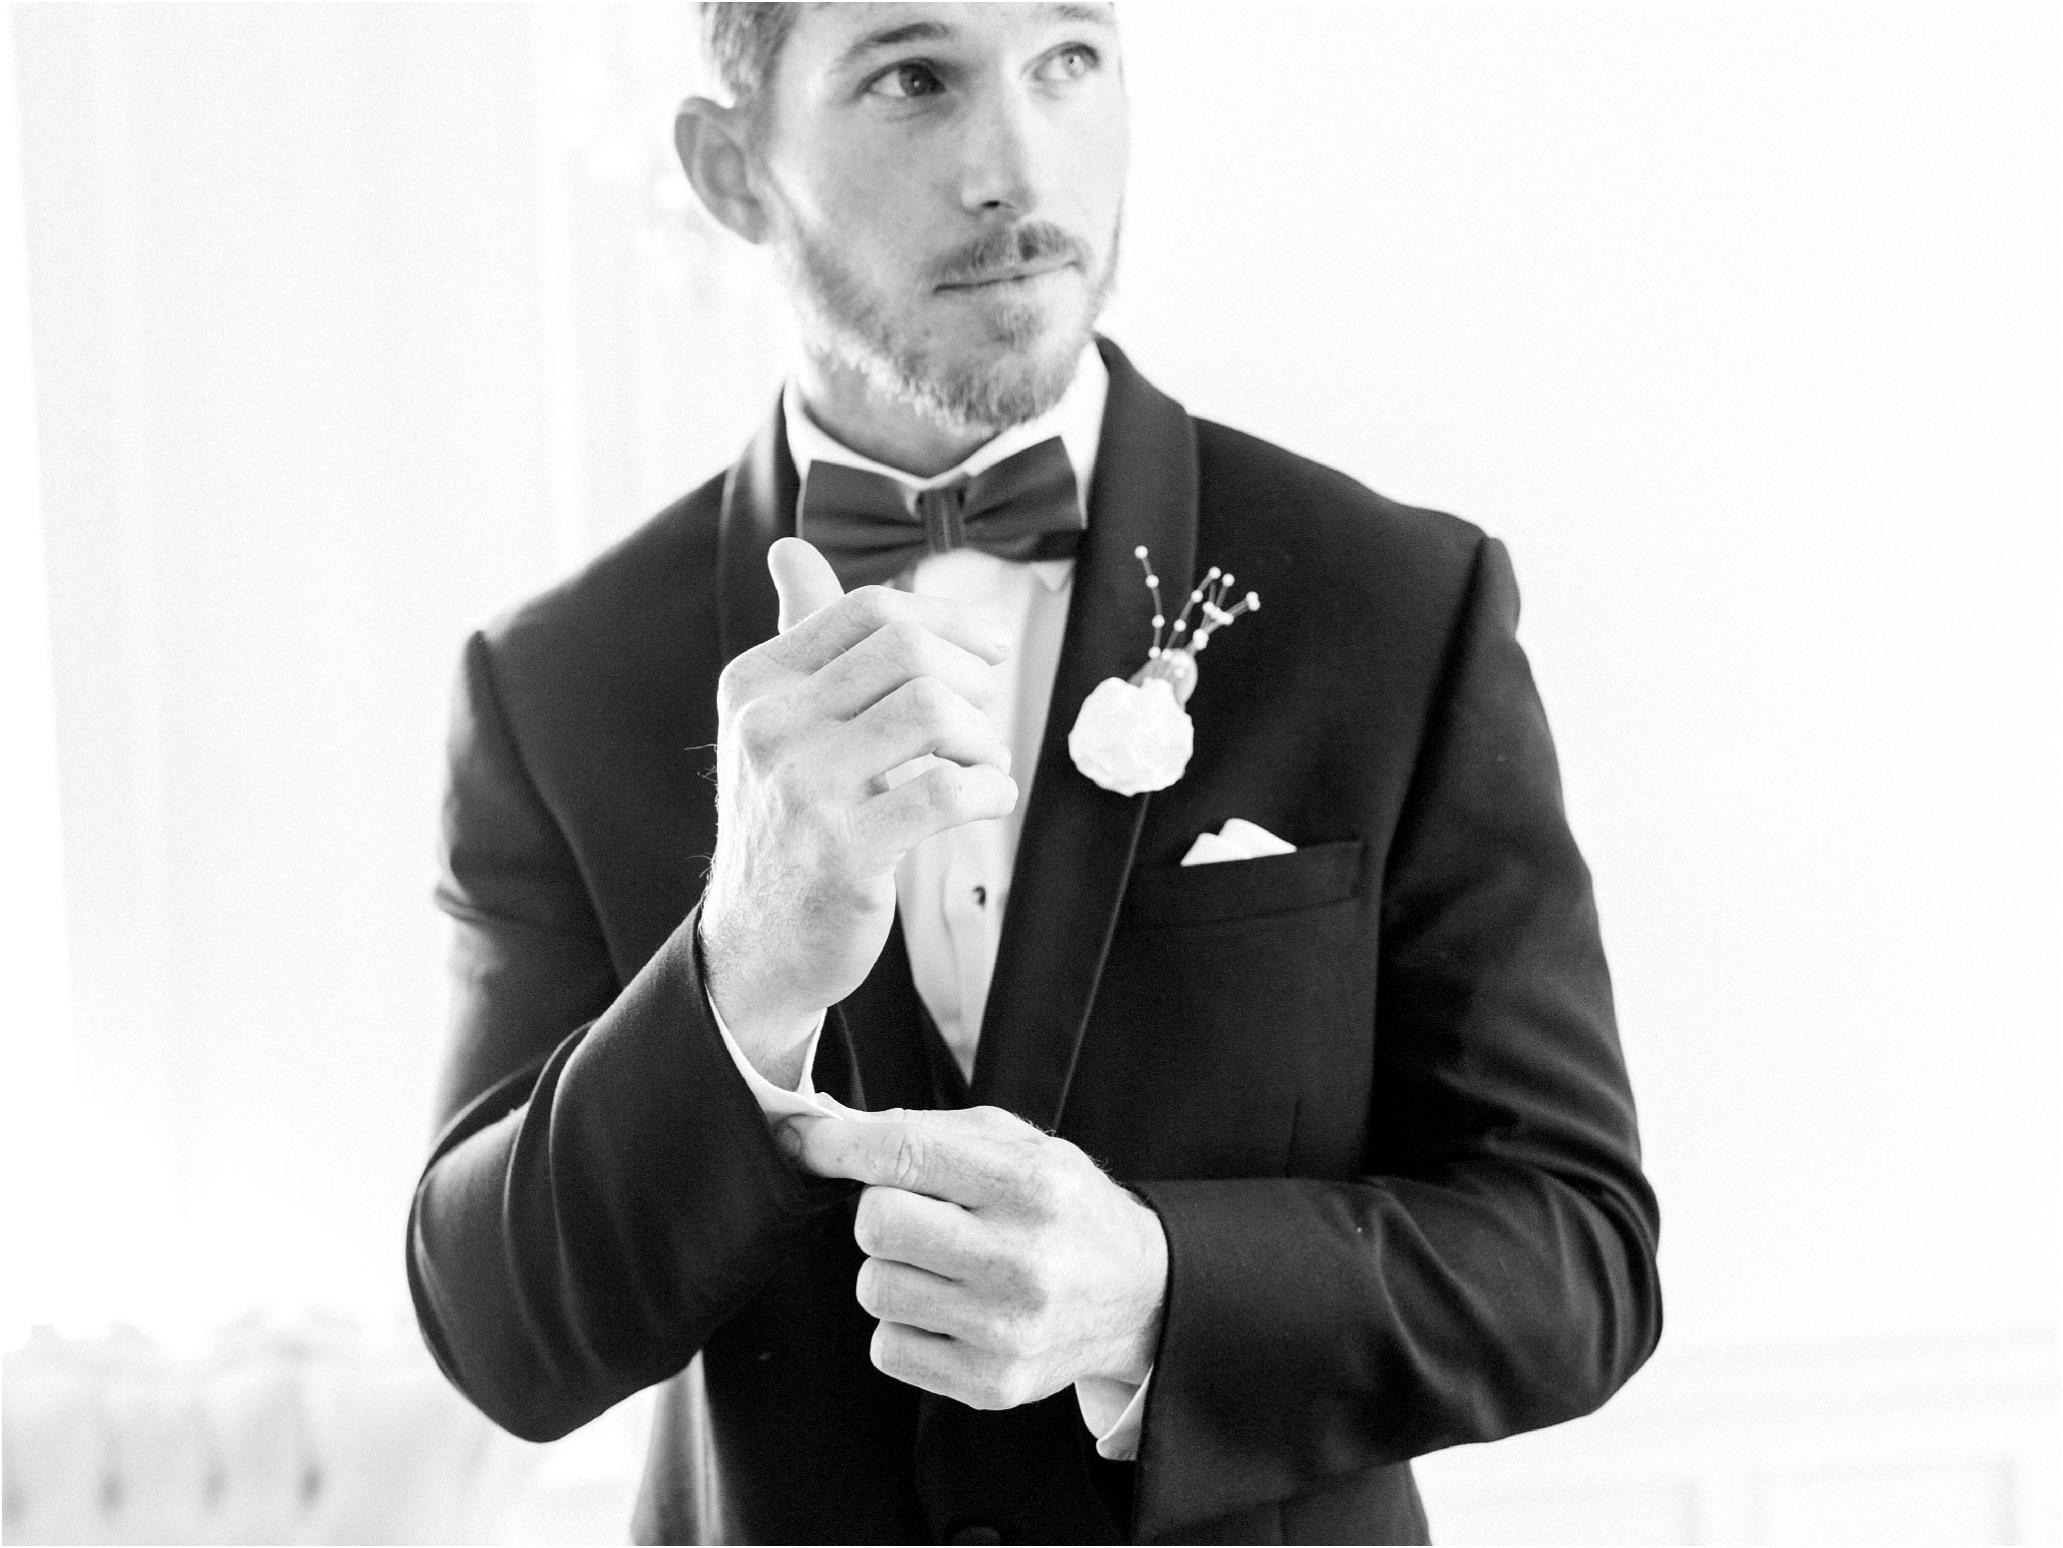 Lisa Silva Photography- Ponte Vedra Beach and Jacksonville, Florida Fine Art Film Wedding Photography- Wedding at The White Room Villa Blanca in St. Augustine, Florida_0028.jpg